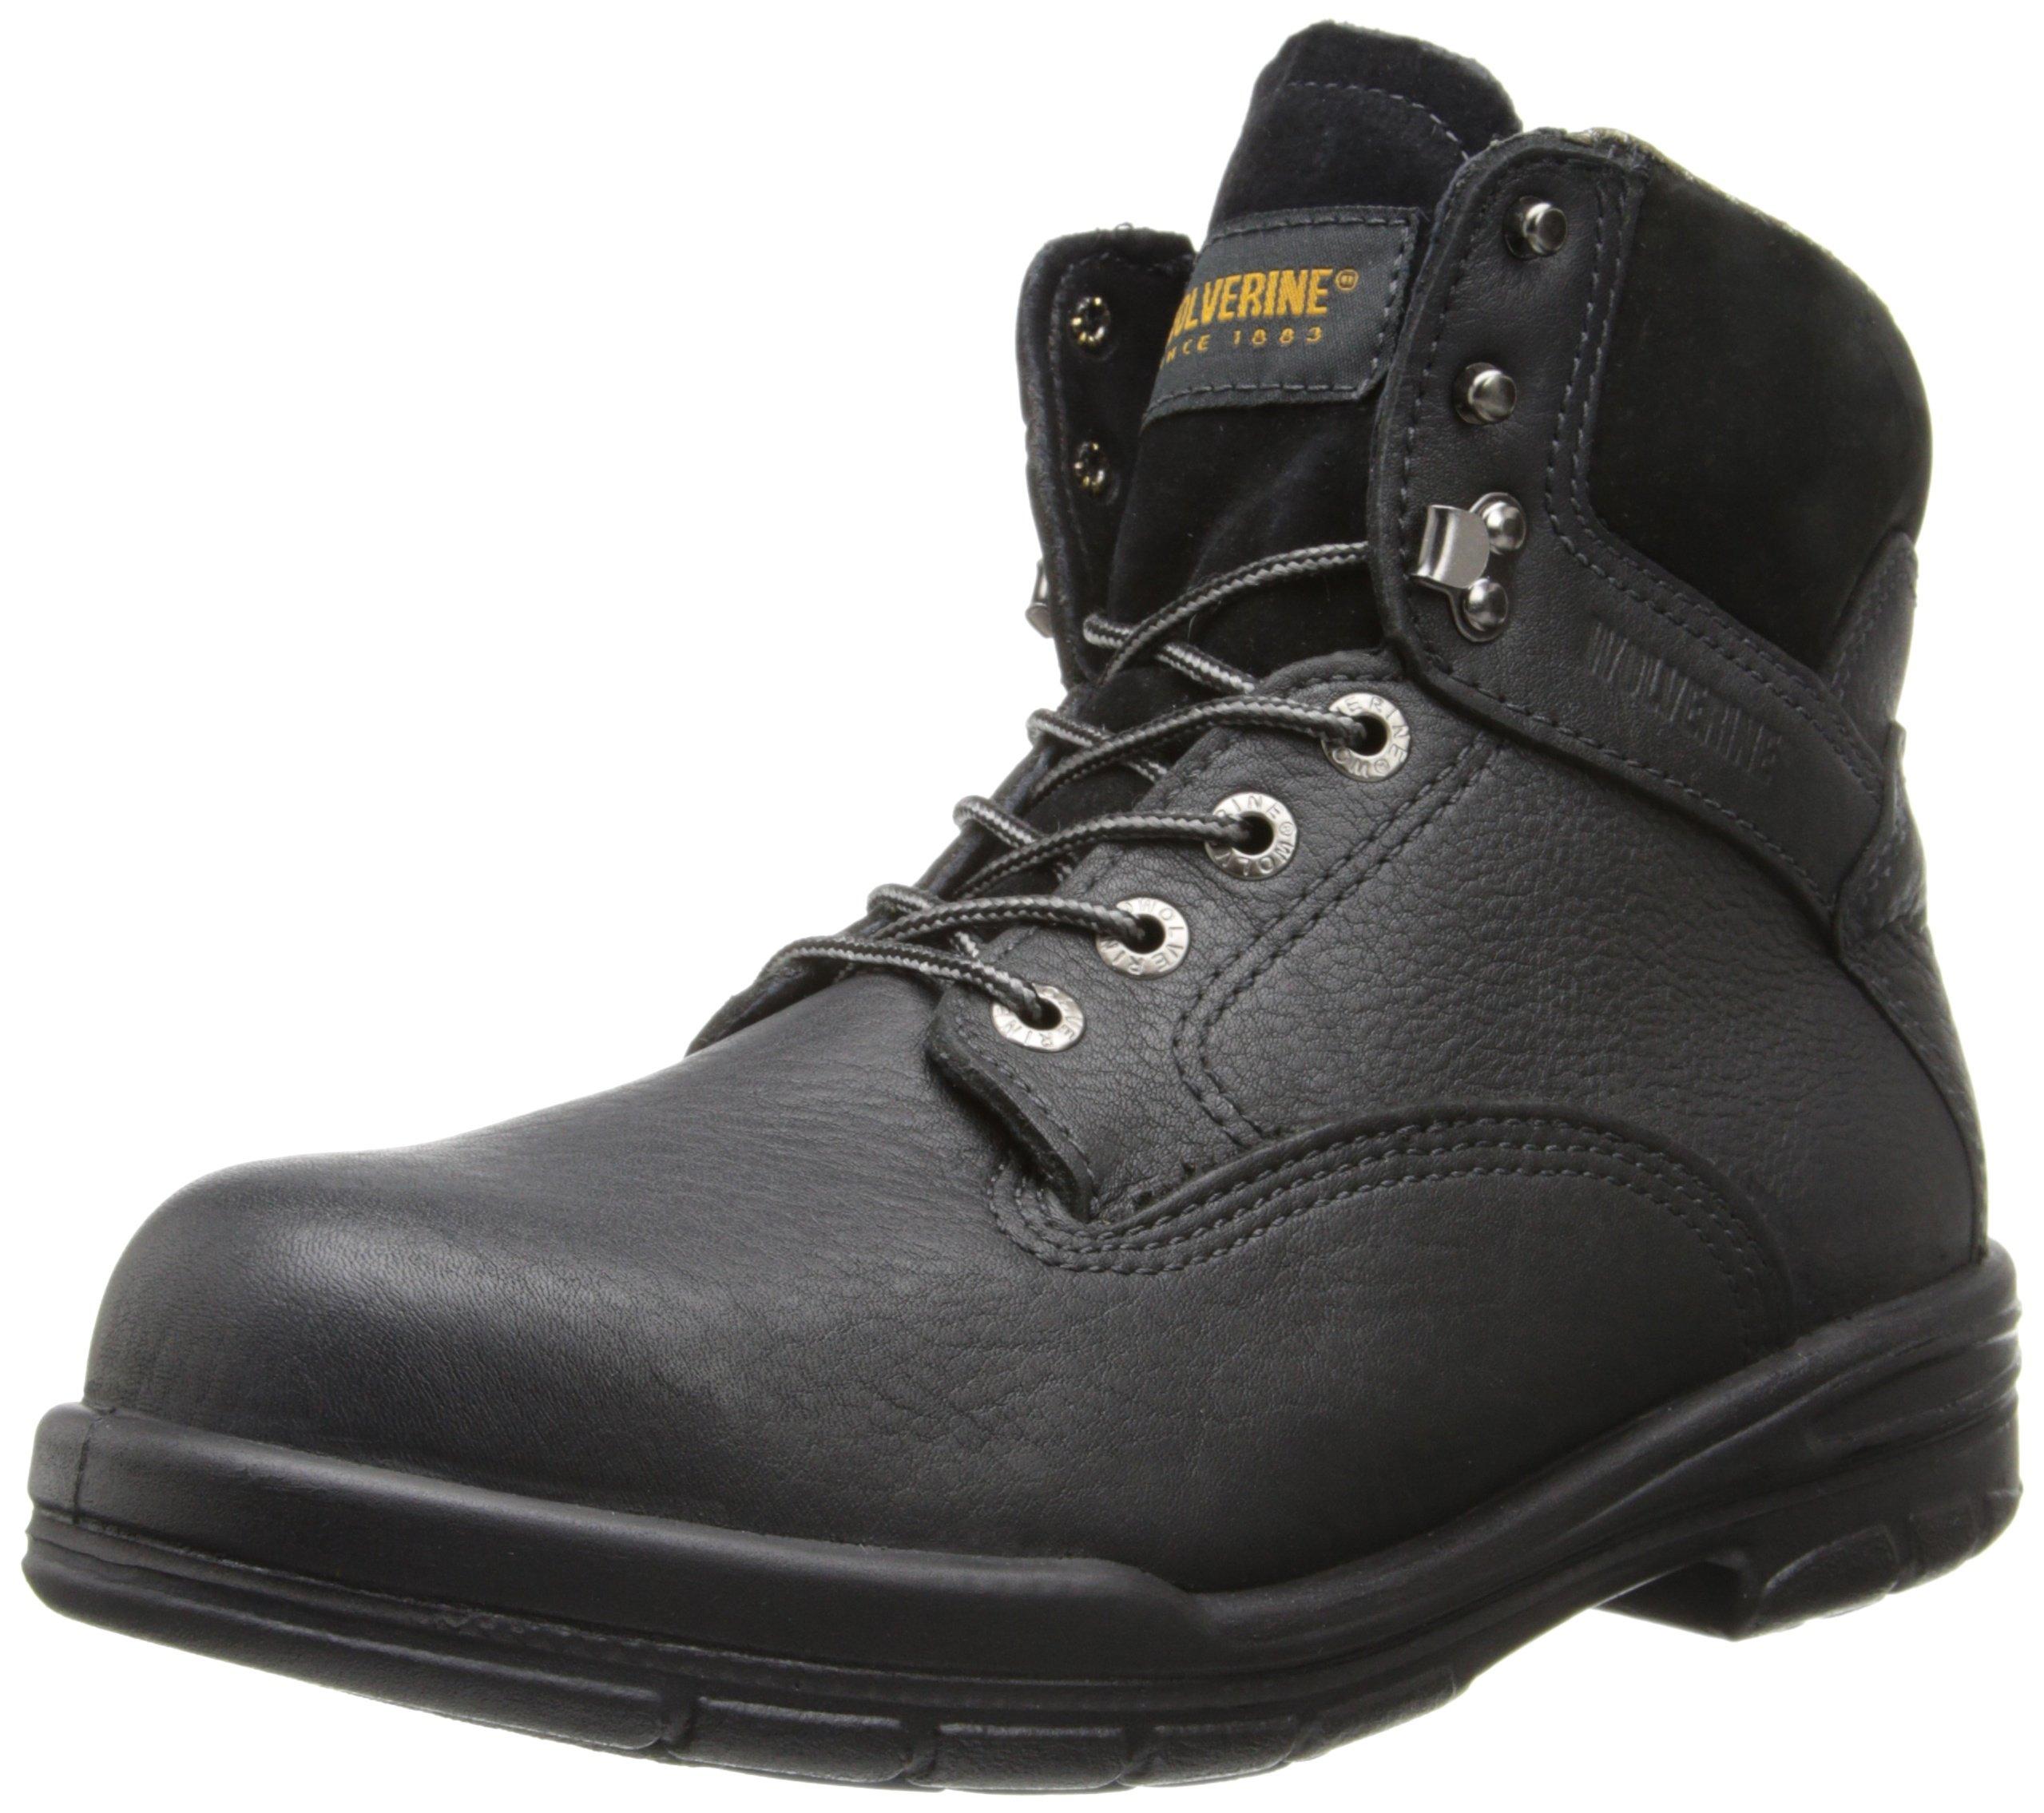 Wolverine Men's SR Durashock DS MNS 6 Inch Steel Toe EH Work Boot, Black, 12 M US